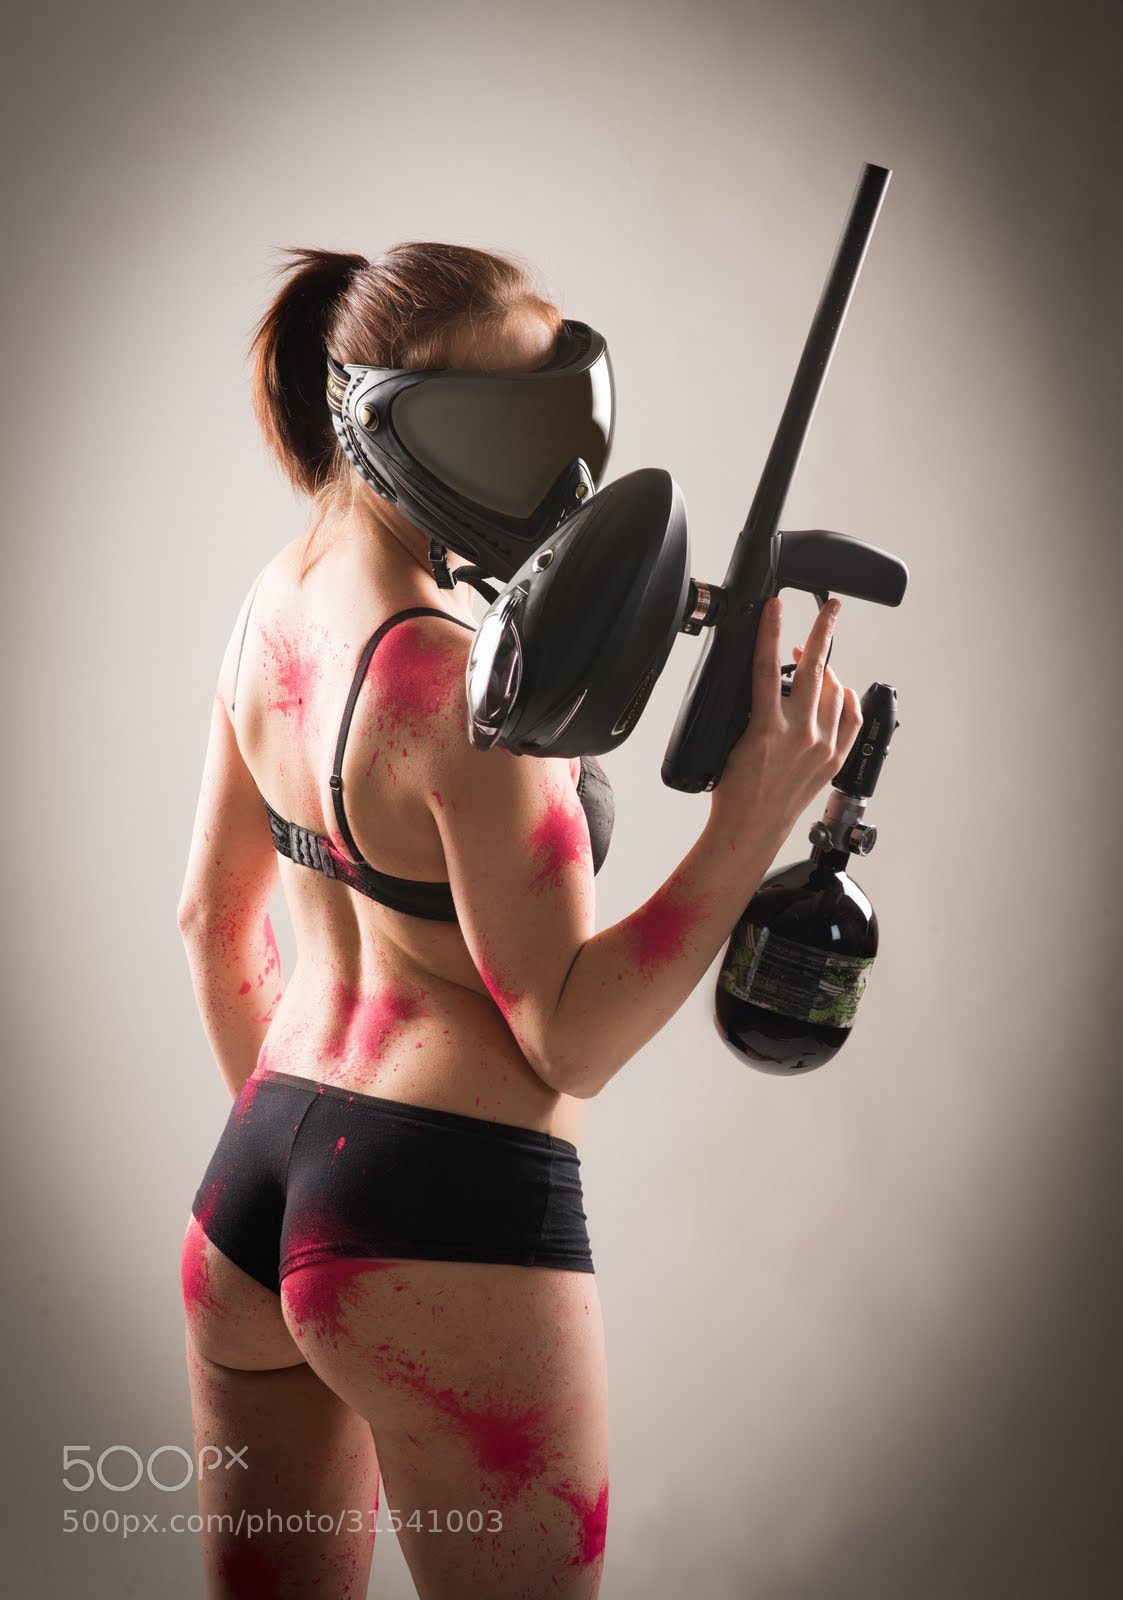 Gun paintball vs nude girl